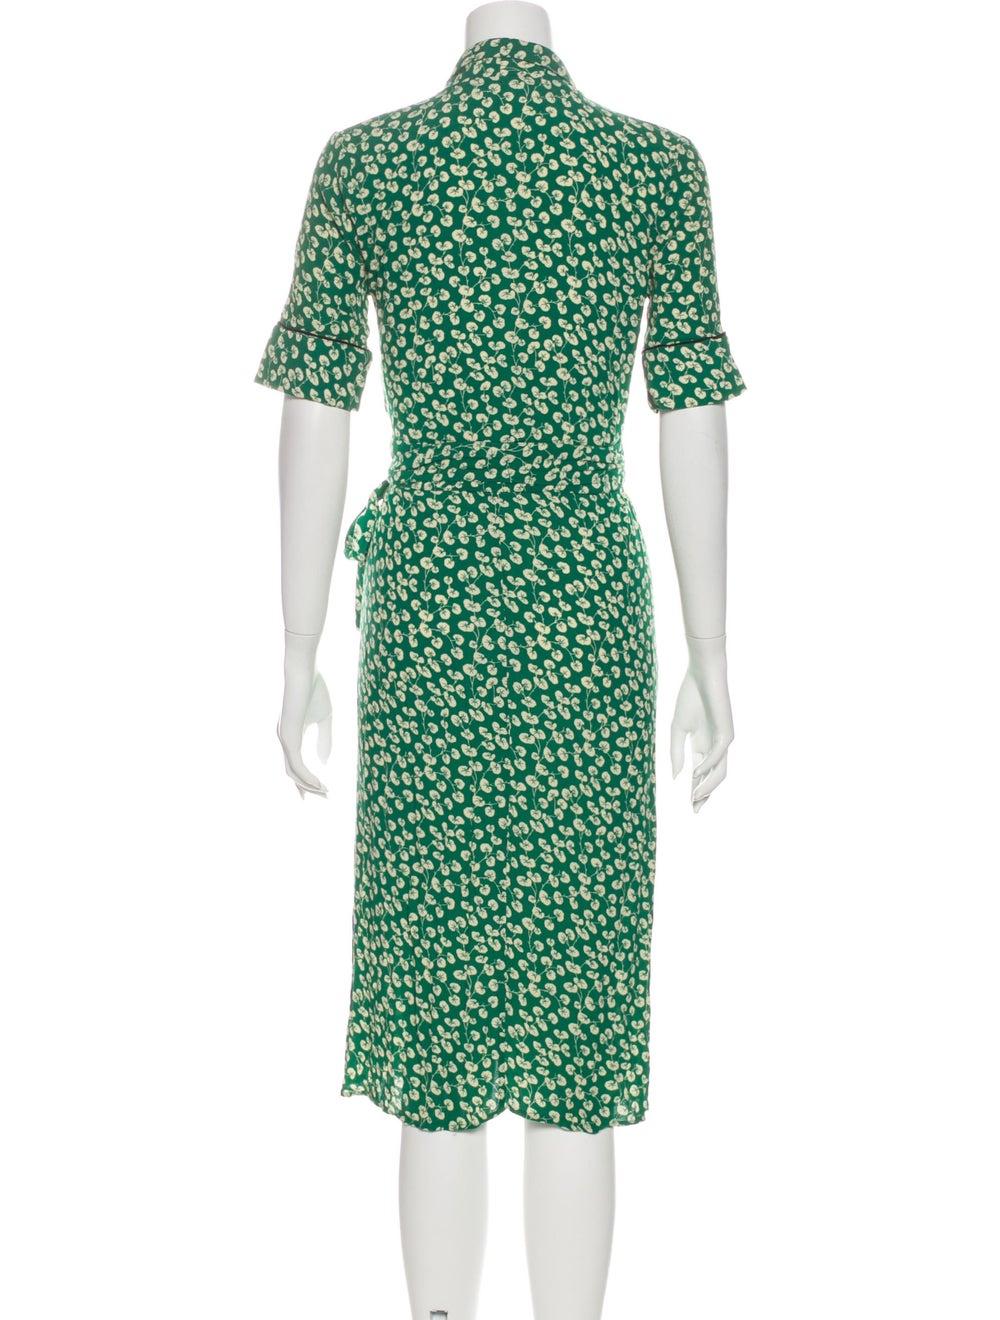 Ganni Printed Midi Length Dress Green - image 3